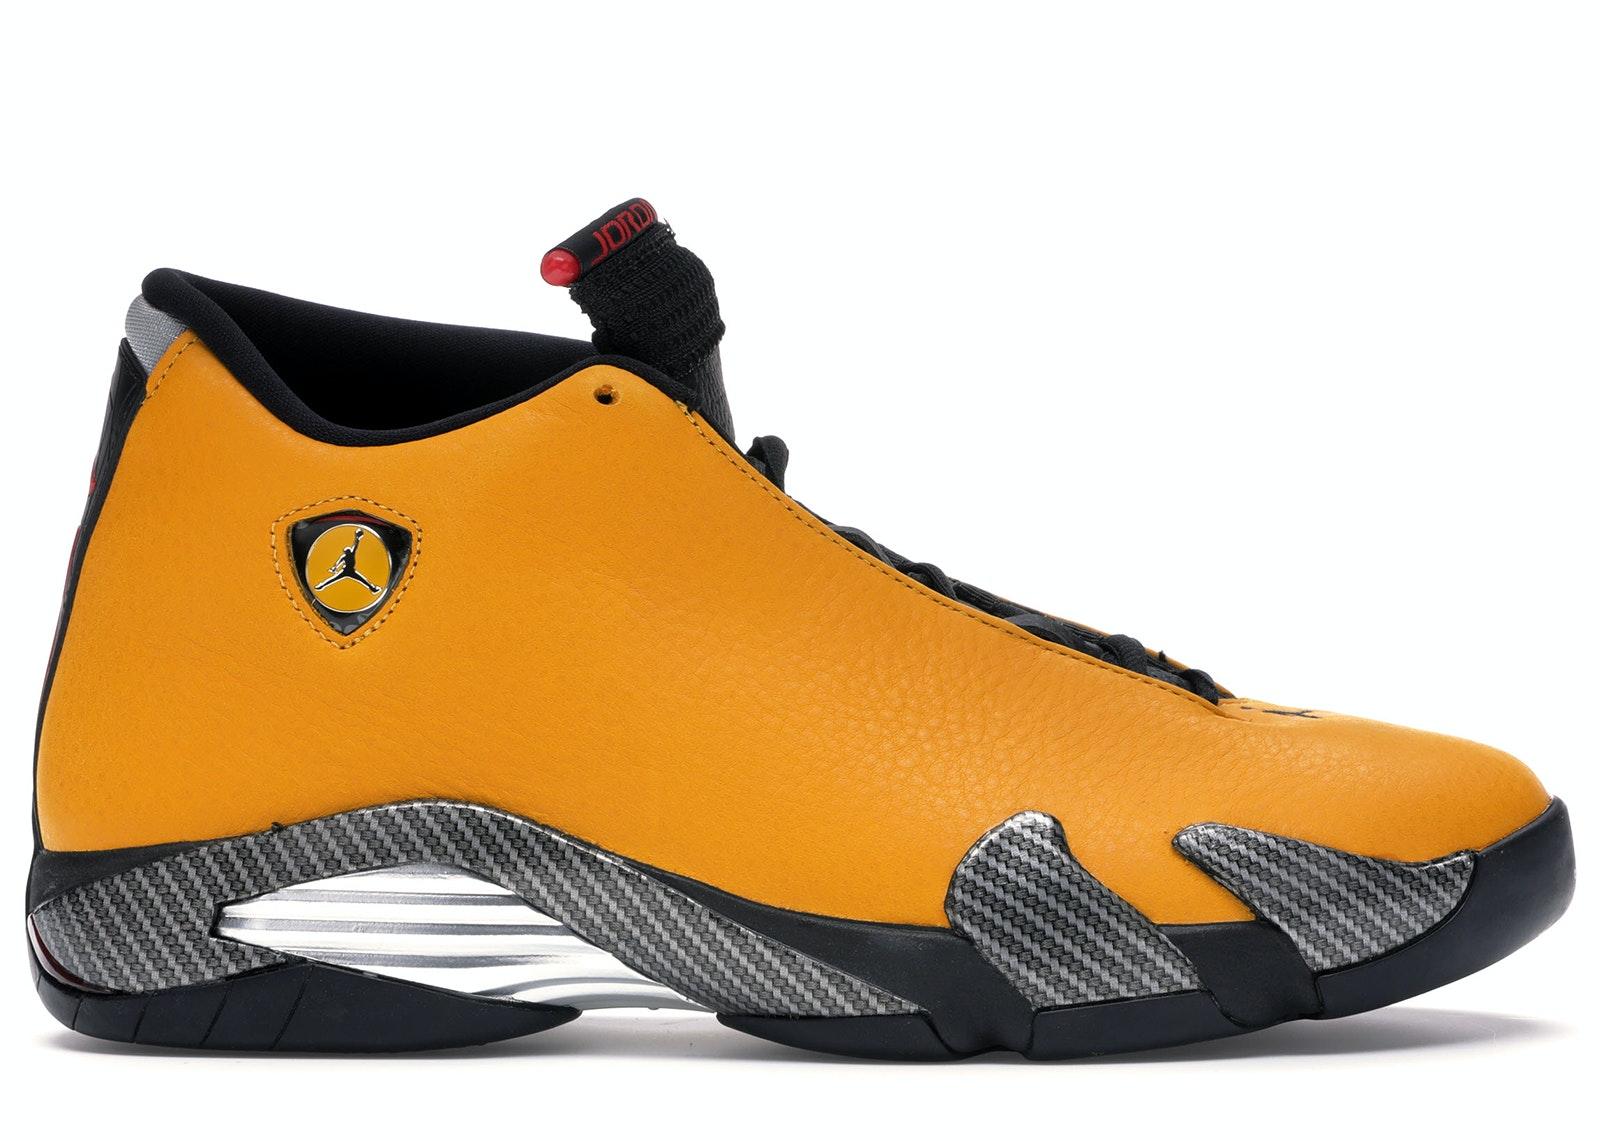 Jordan 14 Retro Ferrari University Gold